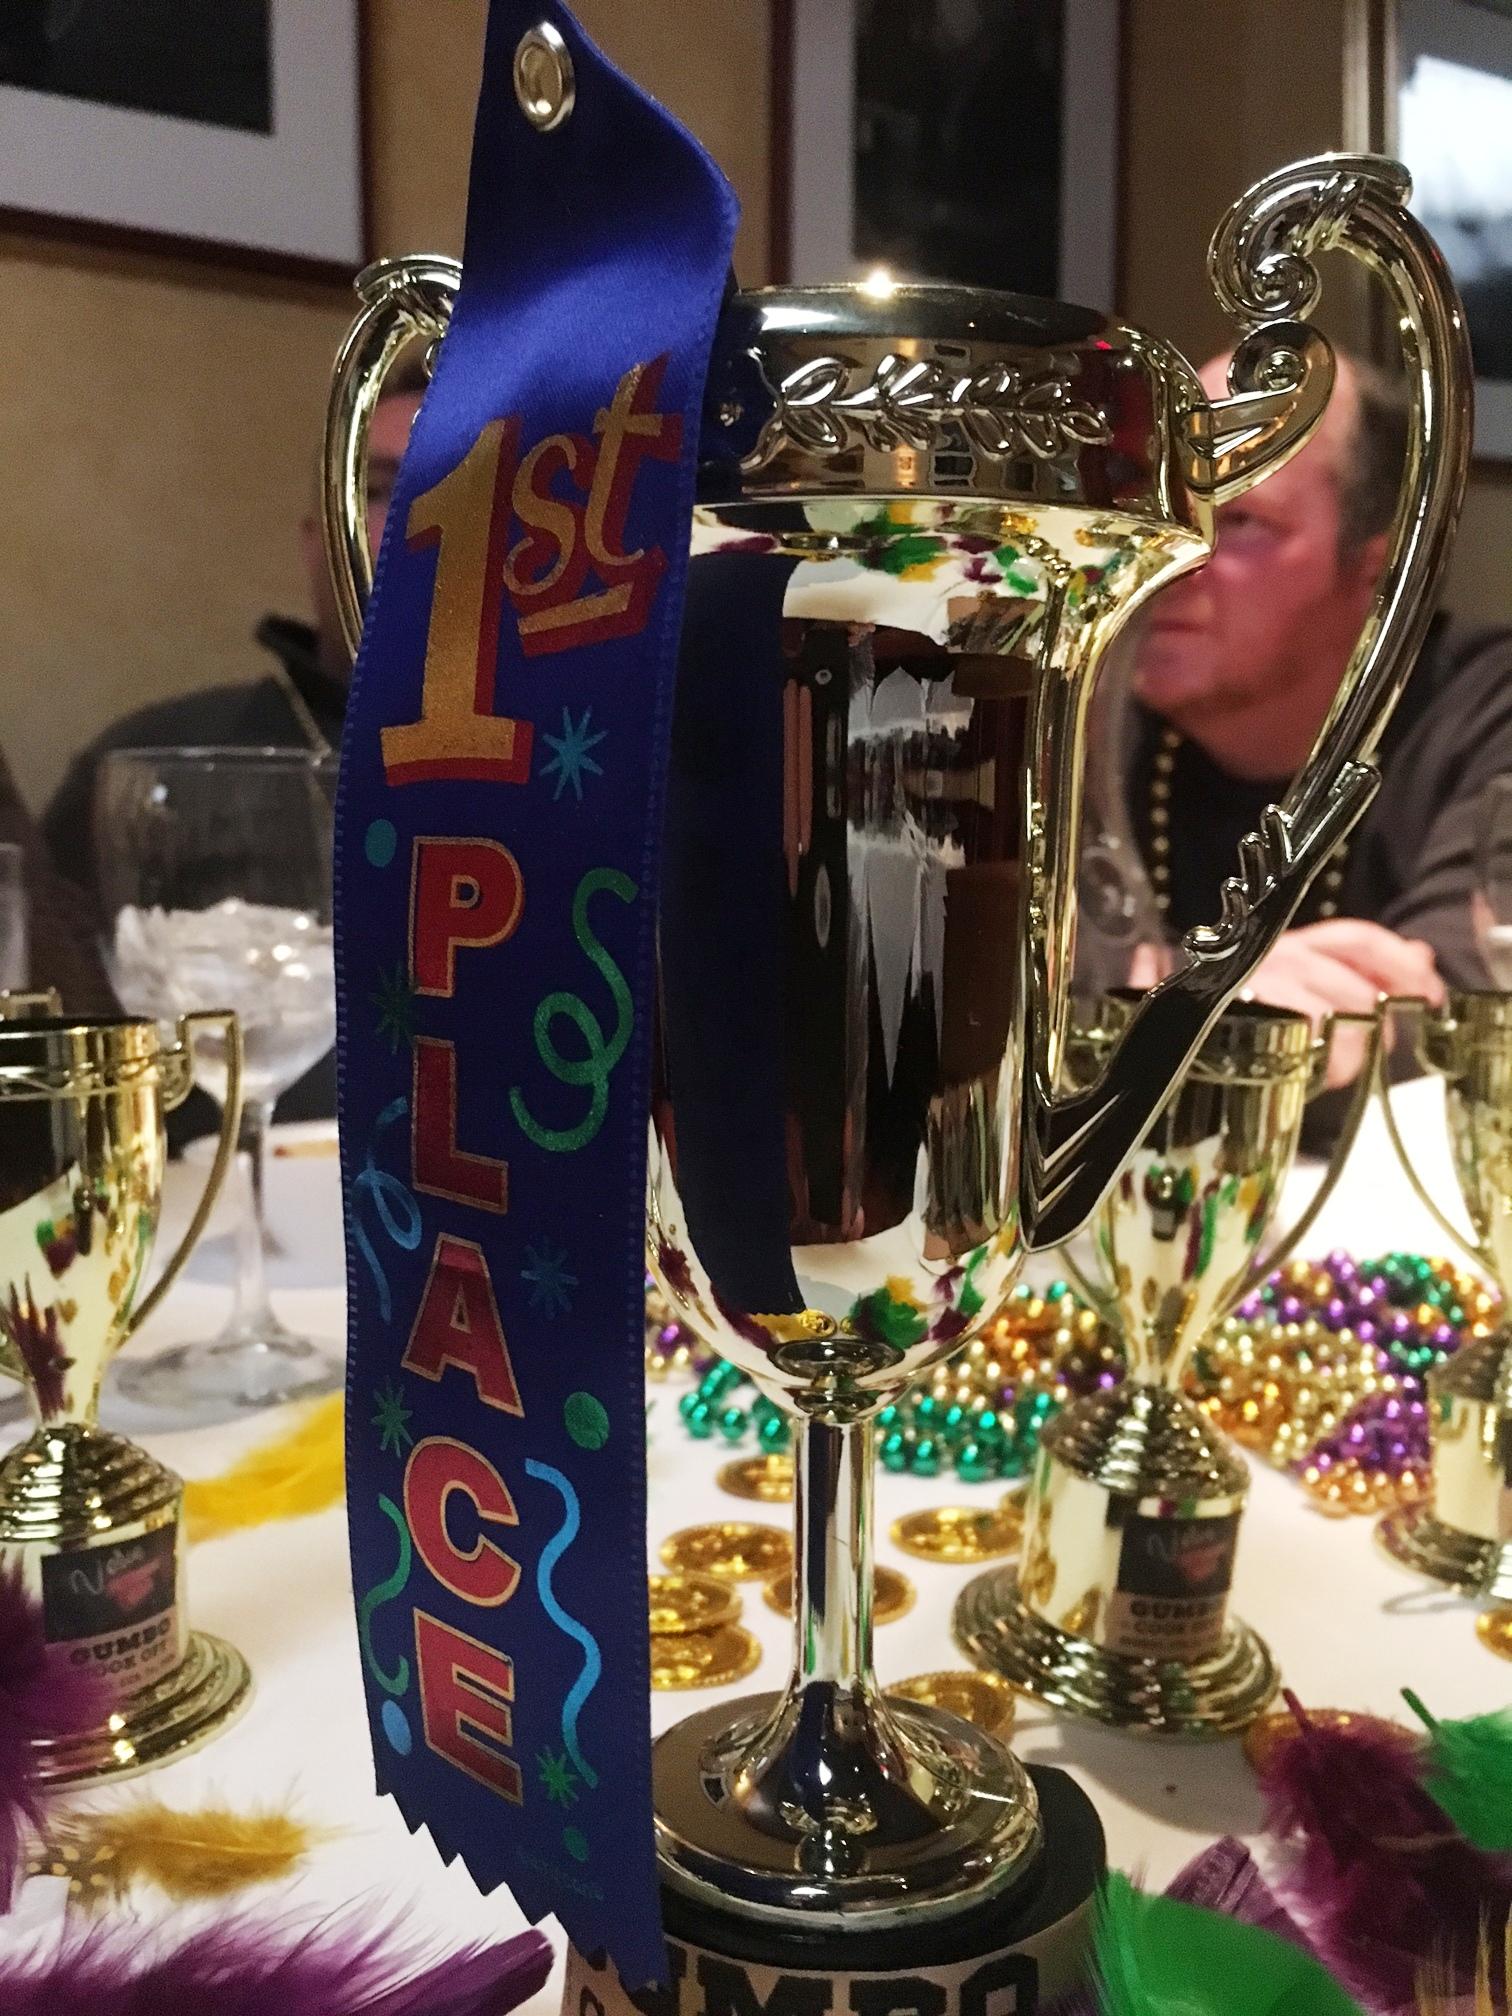 gumbo cook off at somerville restaurant raises money for matheny